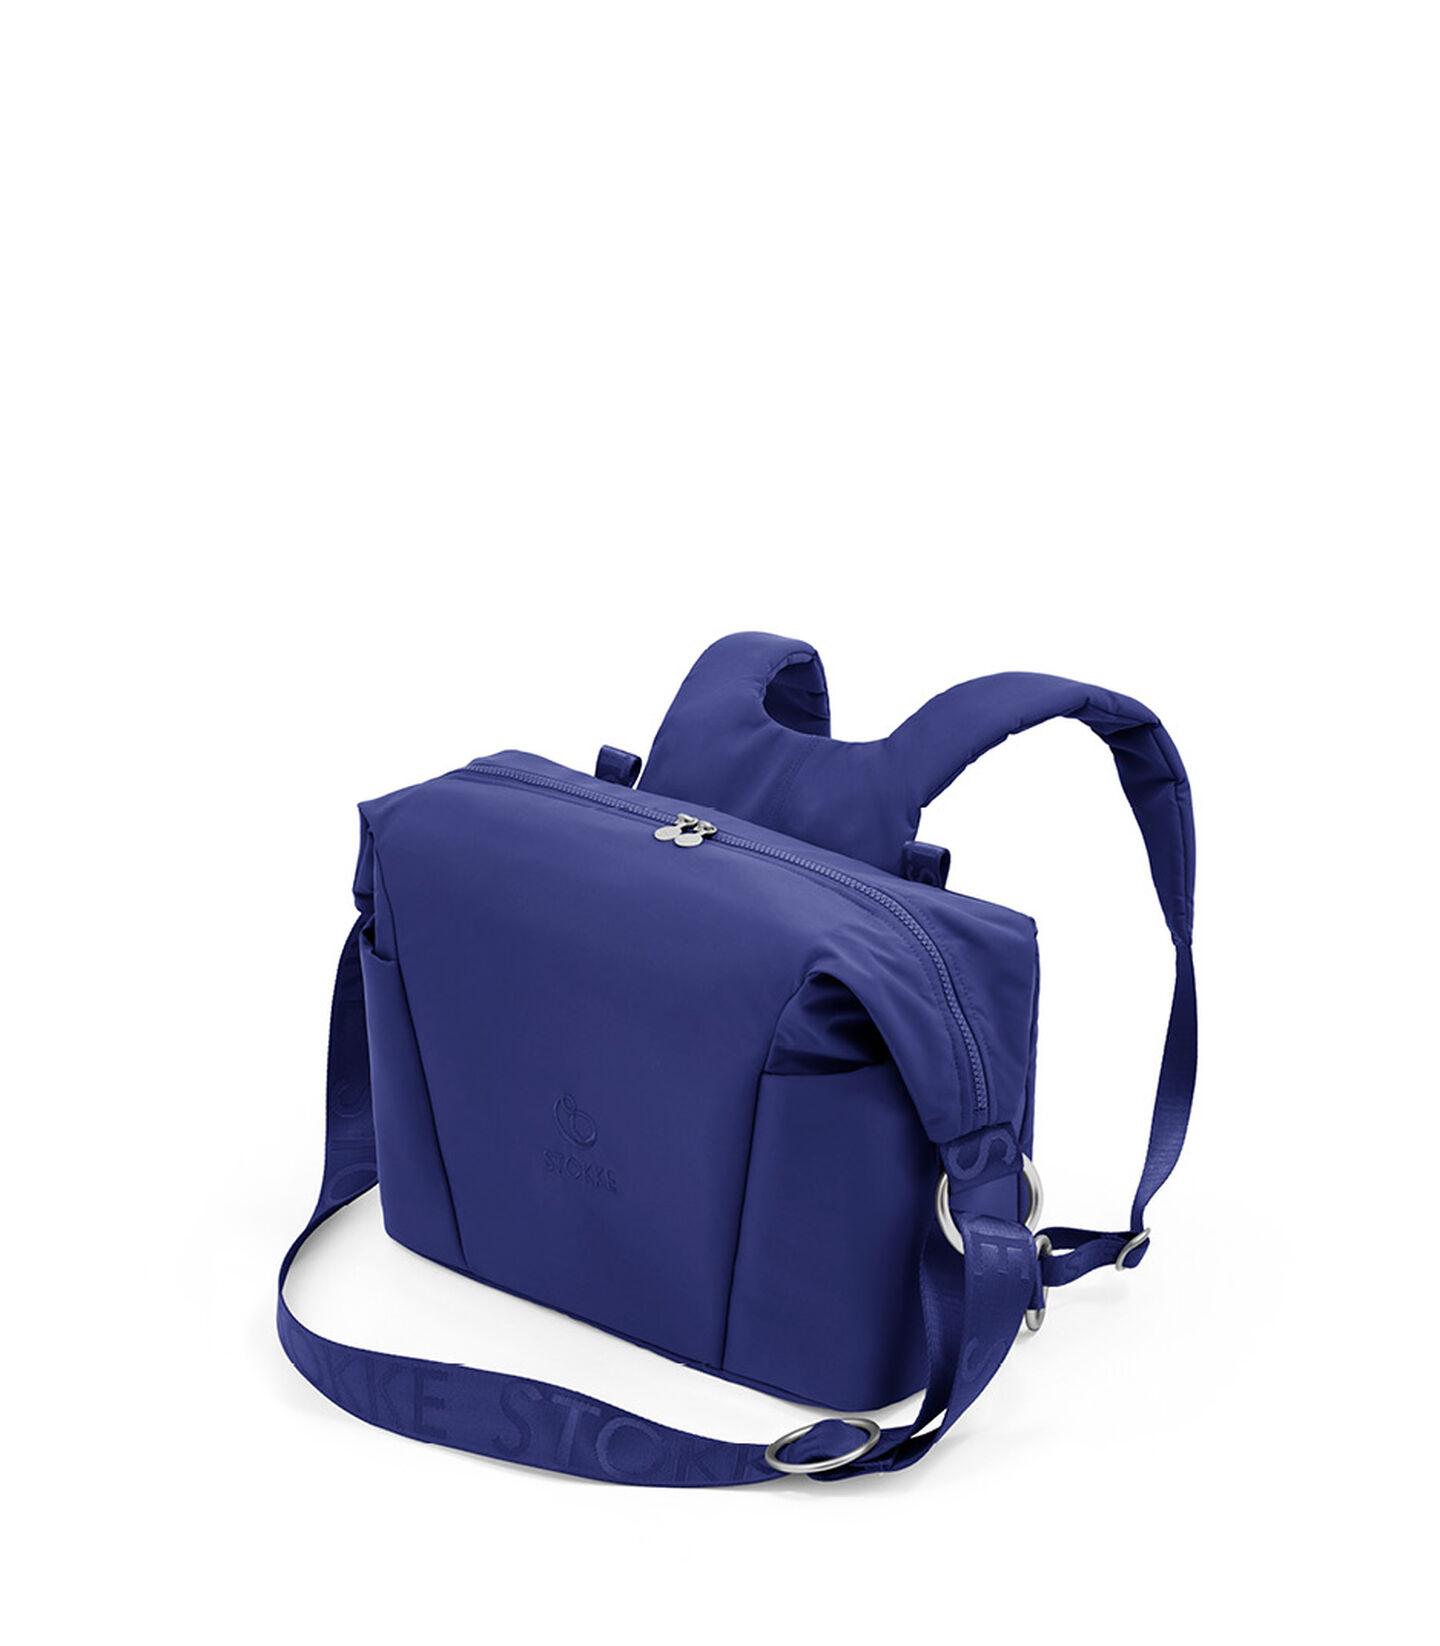 Stokke® Xplory® X Changing bag Royal Blue, Blu Reale, mainview view 2